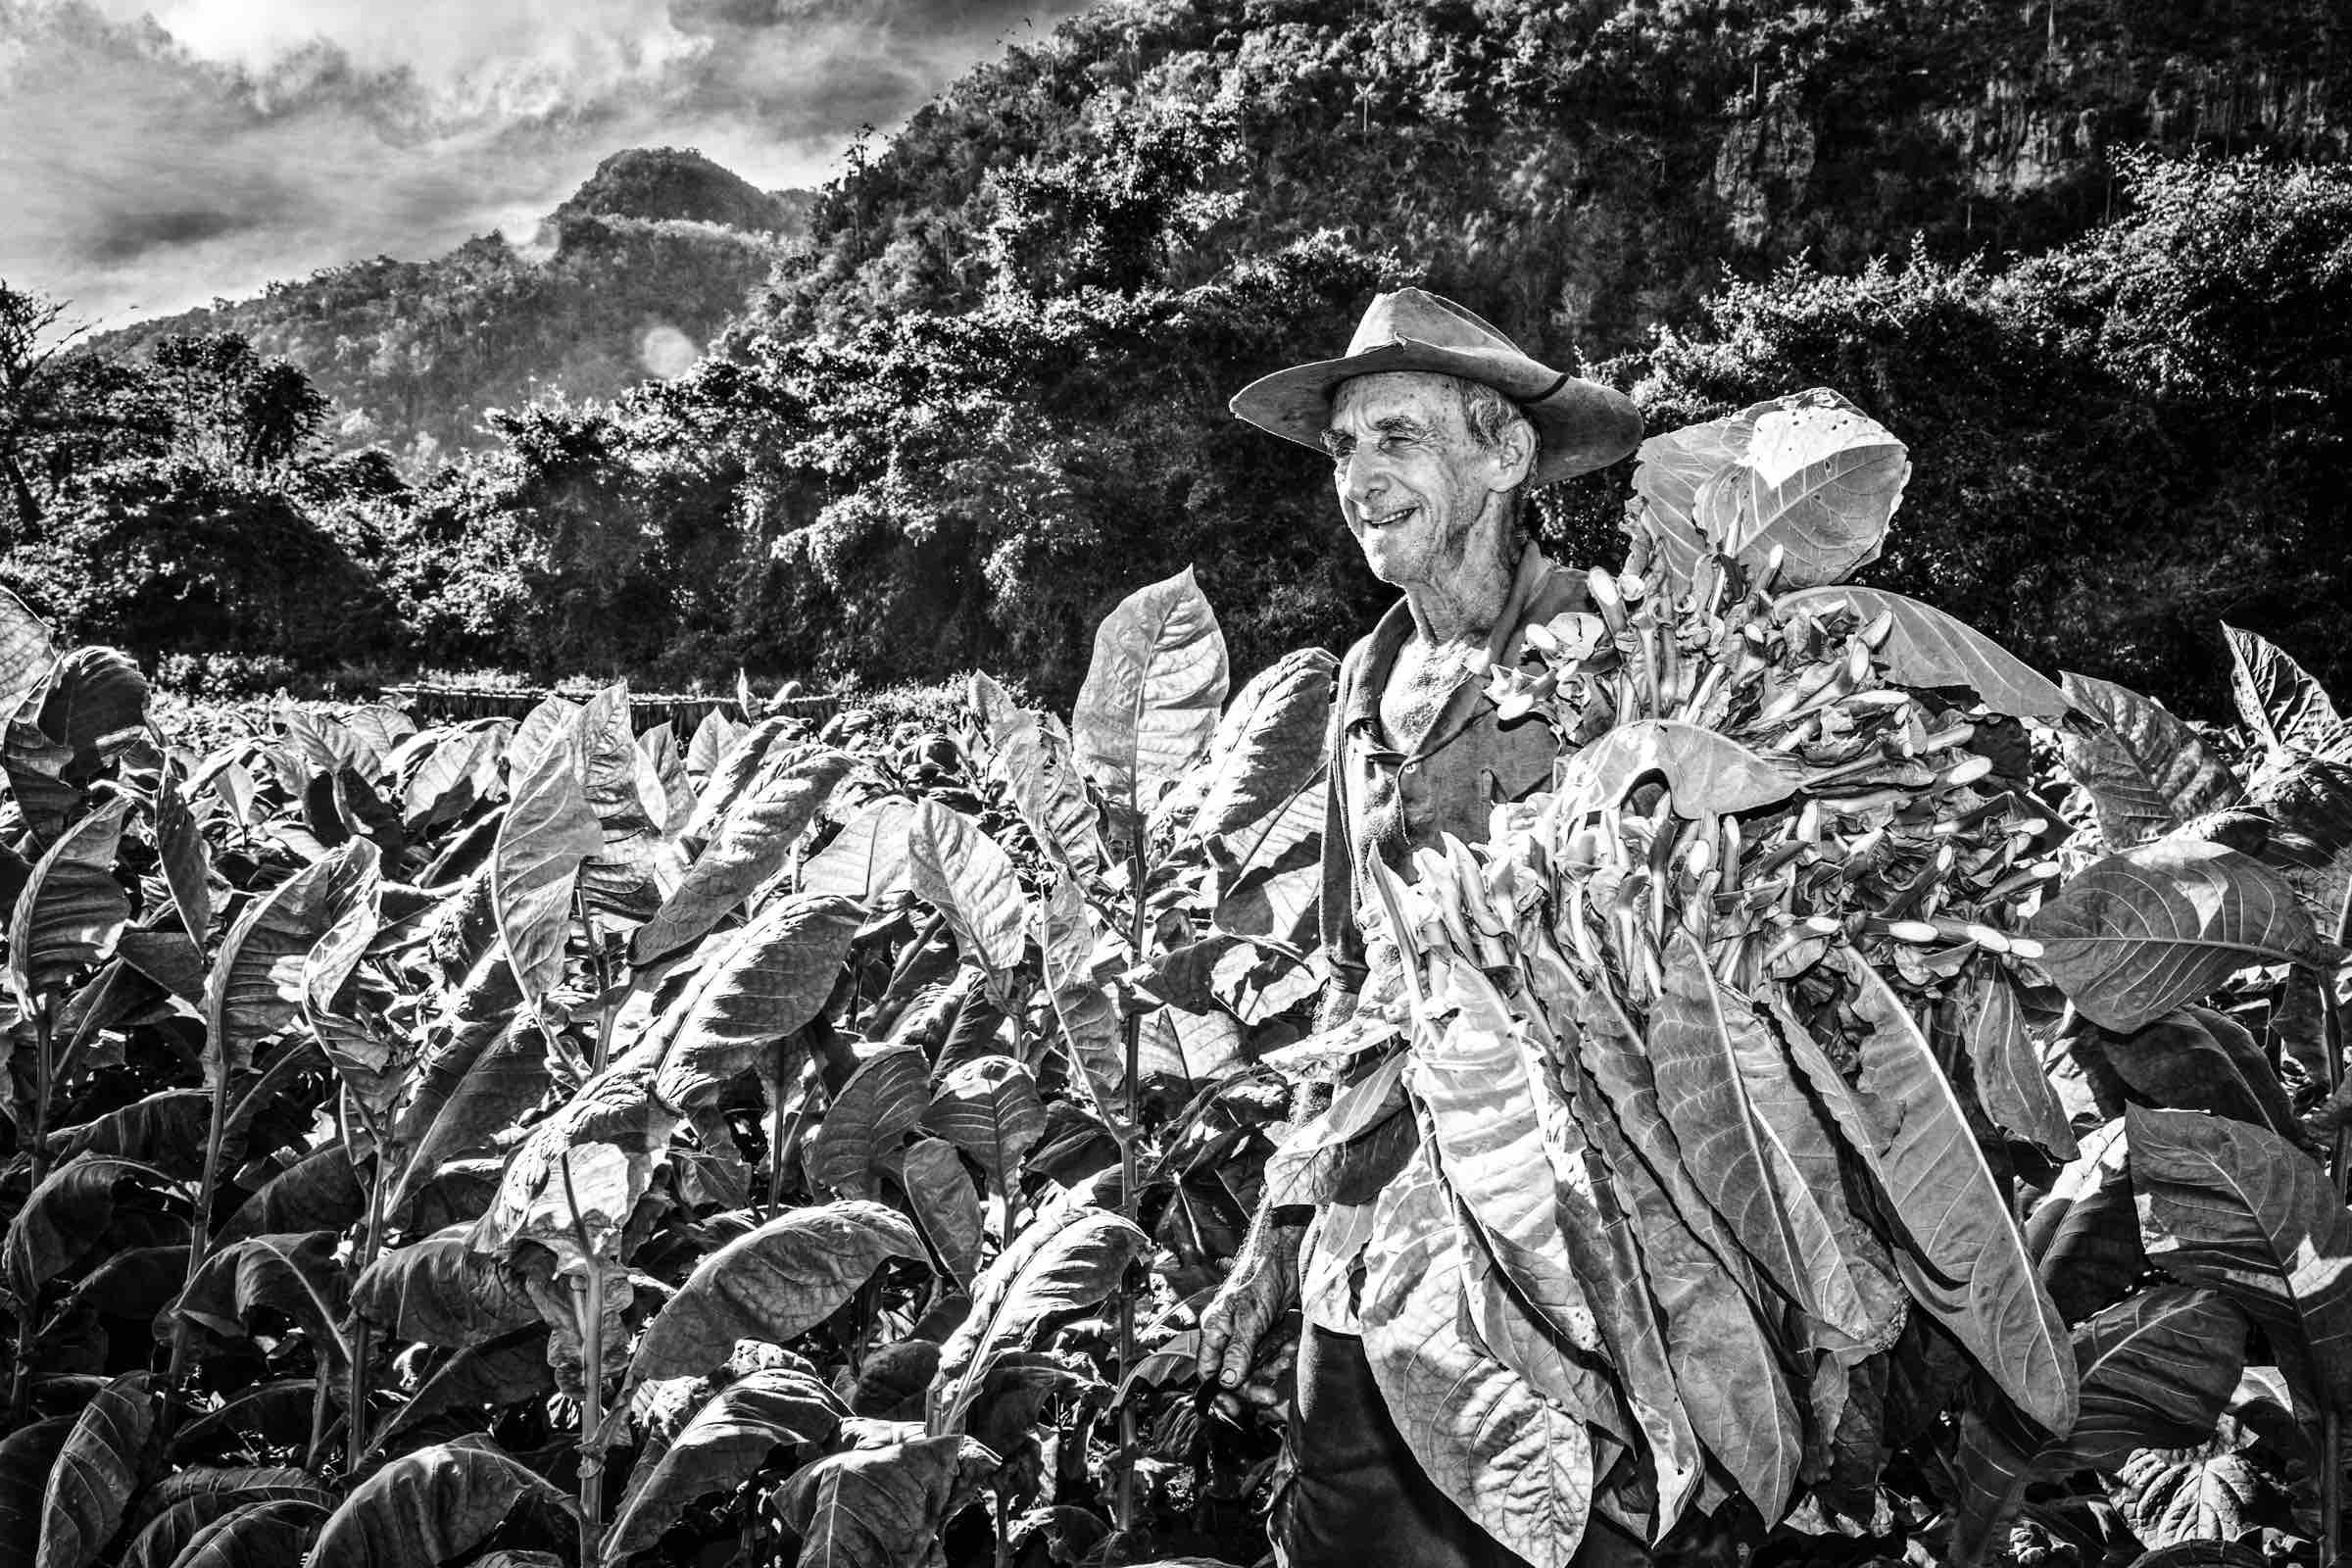 Zigarrendreher | Zigarren | Sumatra | Tabak | Rohtabak | Indonesien | Deckblatt | Umblatt | Longfiller | Shortfiller